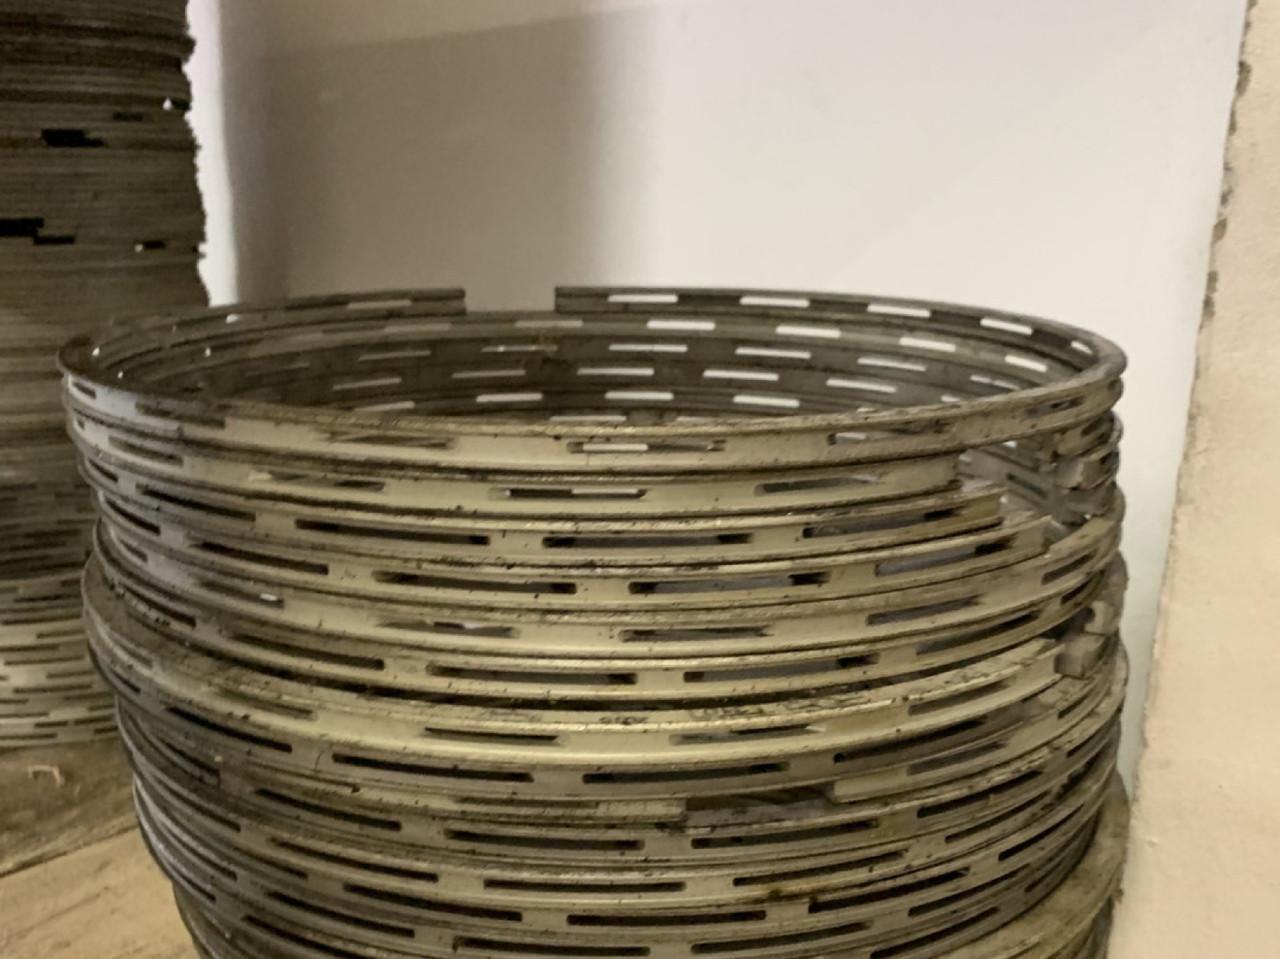 Кольцо поршневое маслосъёмное Д67.08.04.05 Р1/Р2БМЗ ЗАП